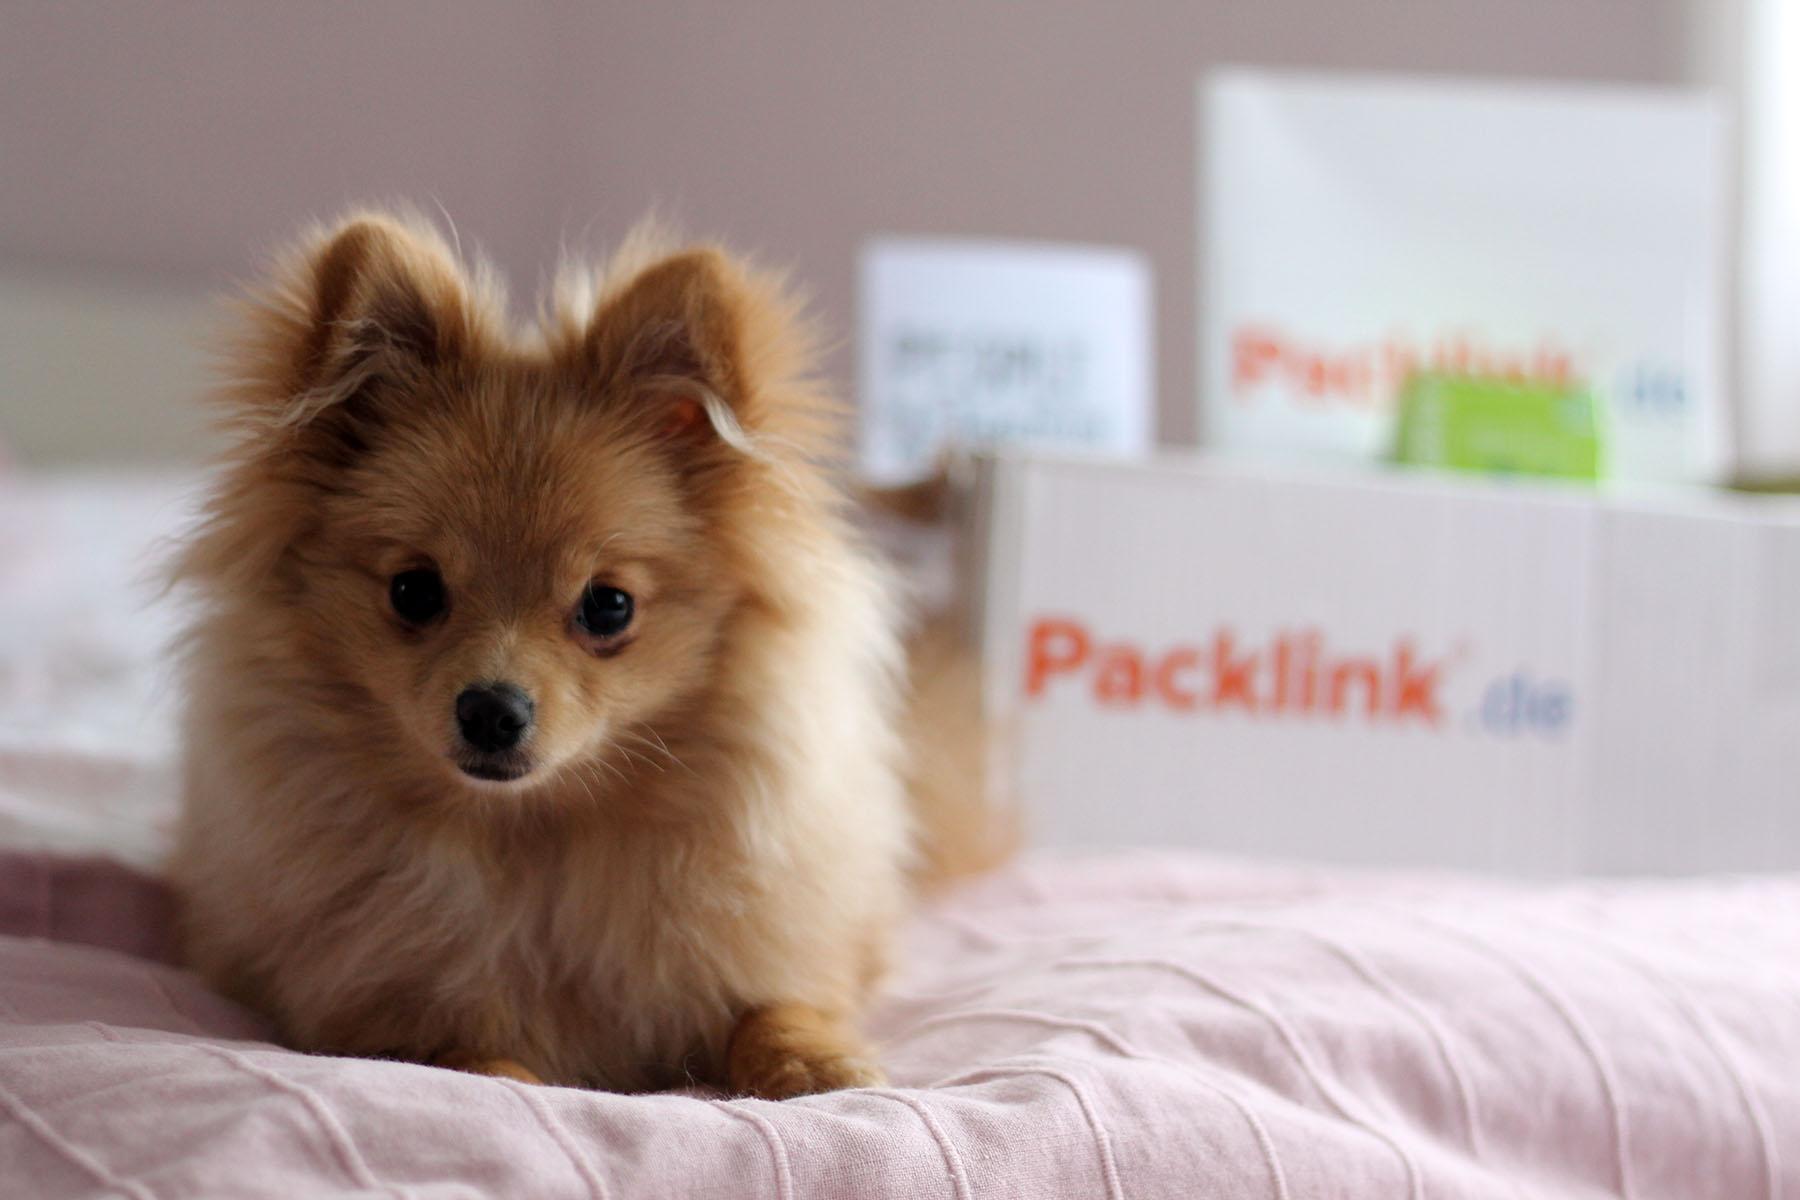 milow-zwergspitz-pomeranian-hund-dog-packlink-modeblog-fashionblog